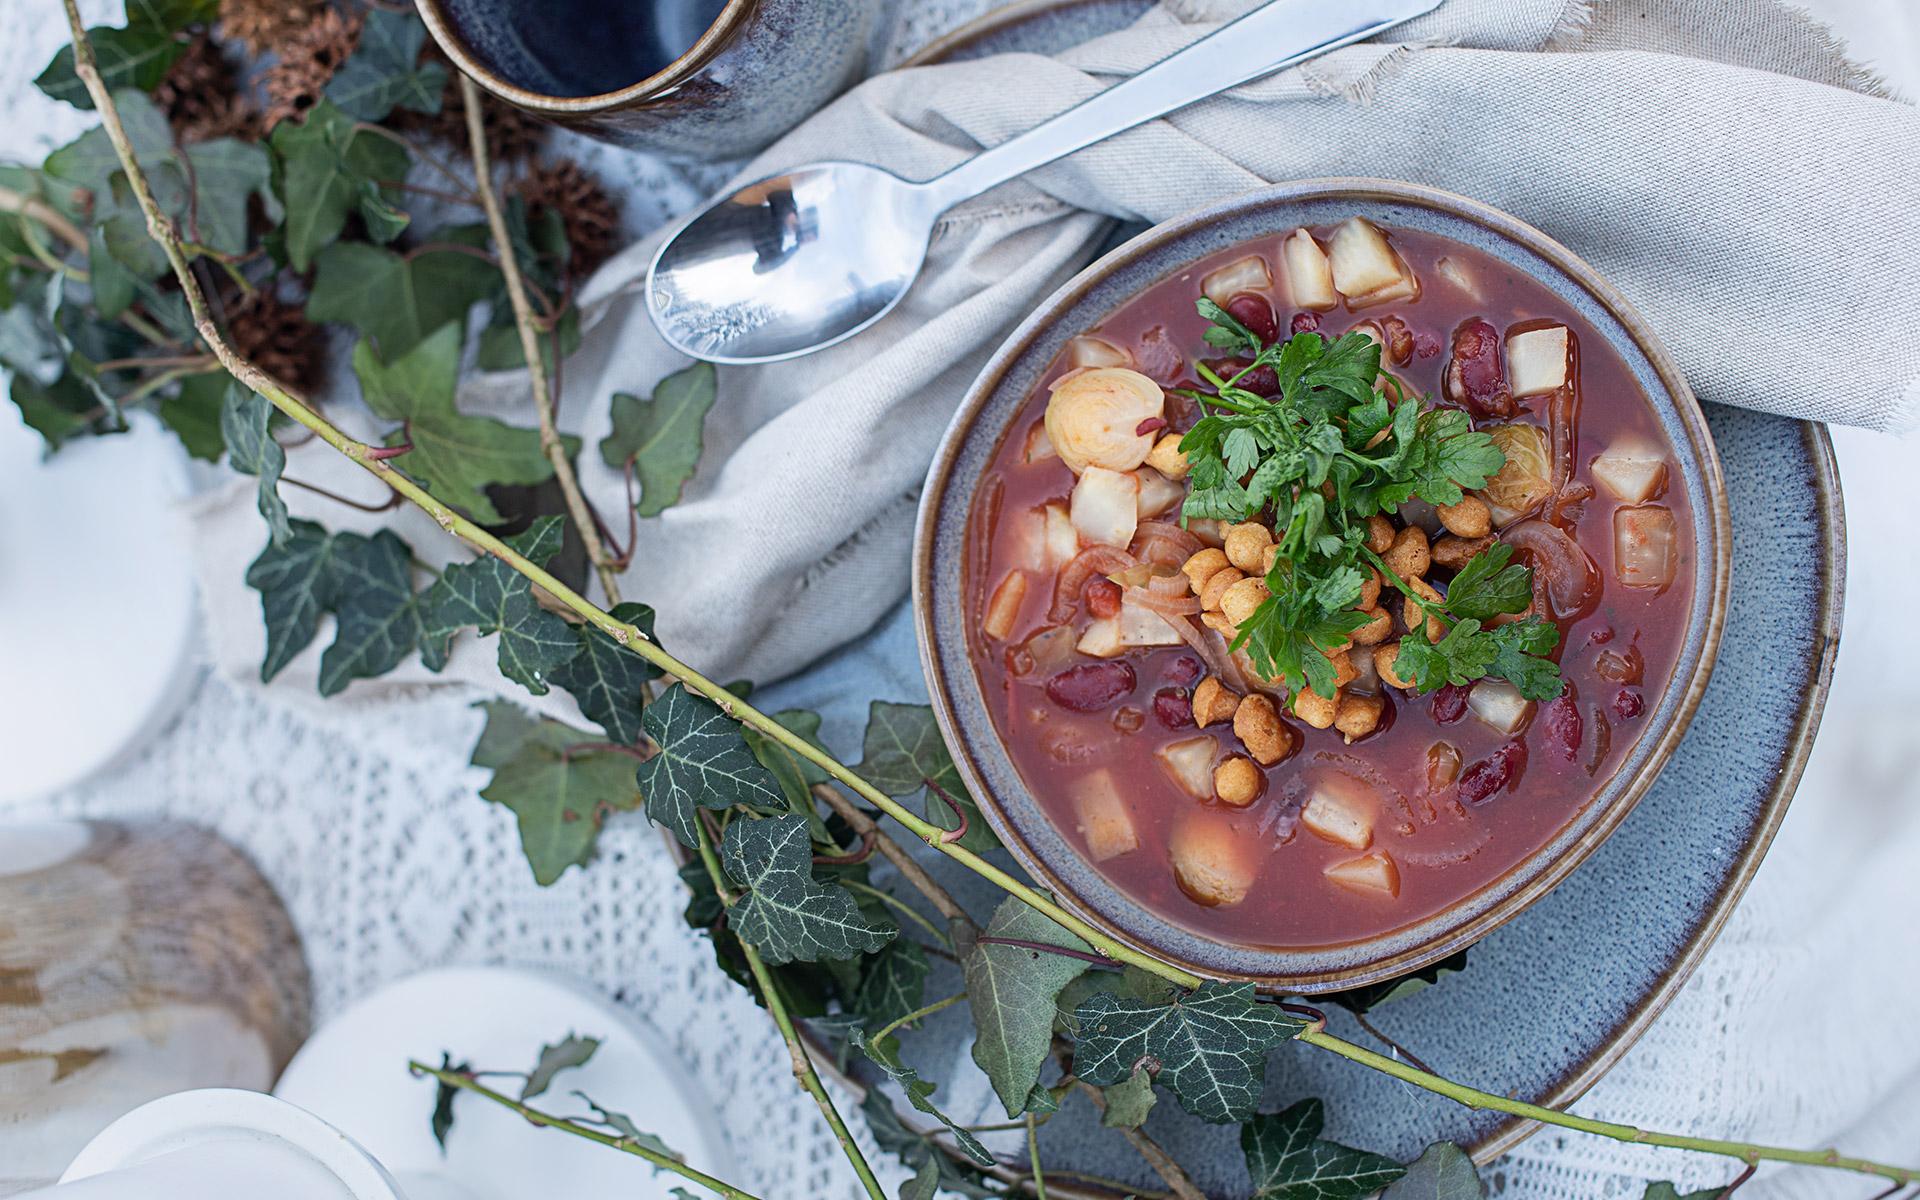 Winter Gemüse Eintopf mit Backerbsen